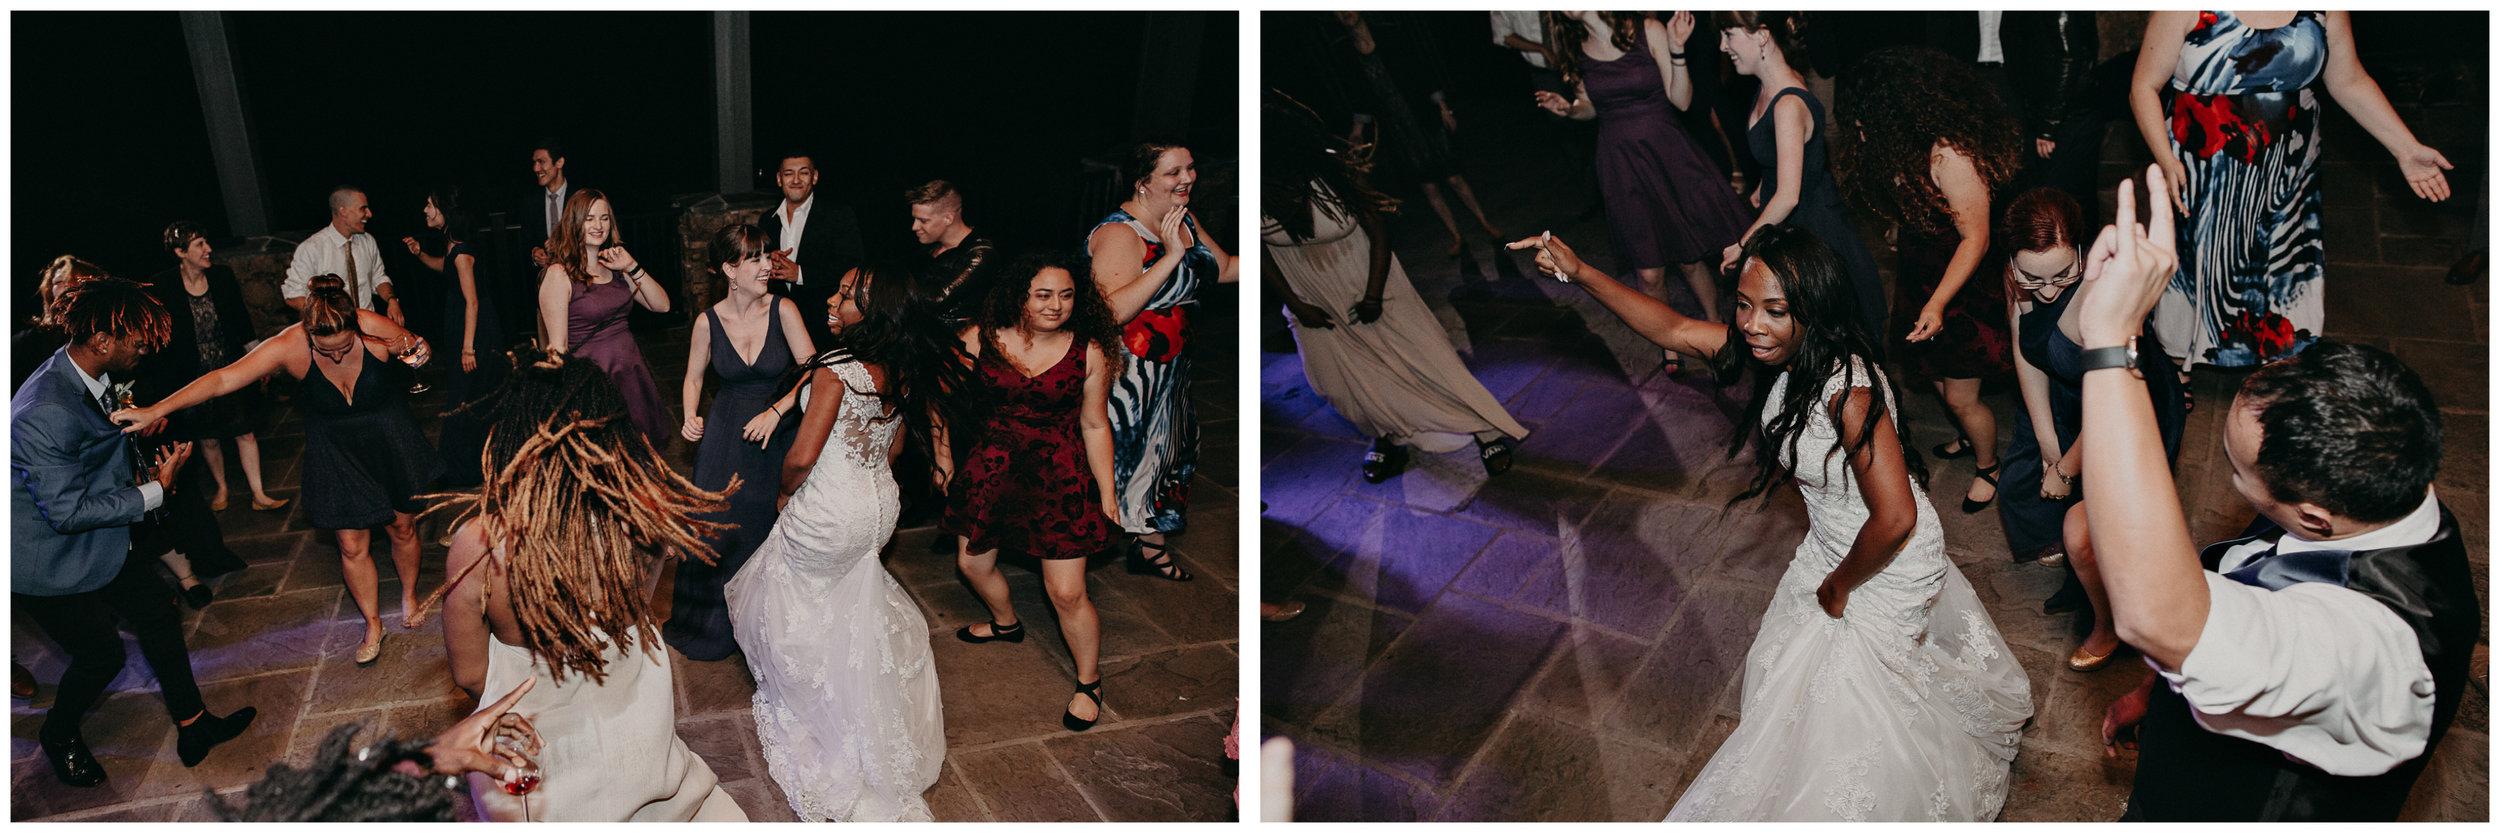 97- Kaya_vineyard_dahlonega_wedding_venue_detais_reception_aline_marin_photography.jpg